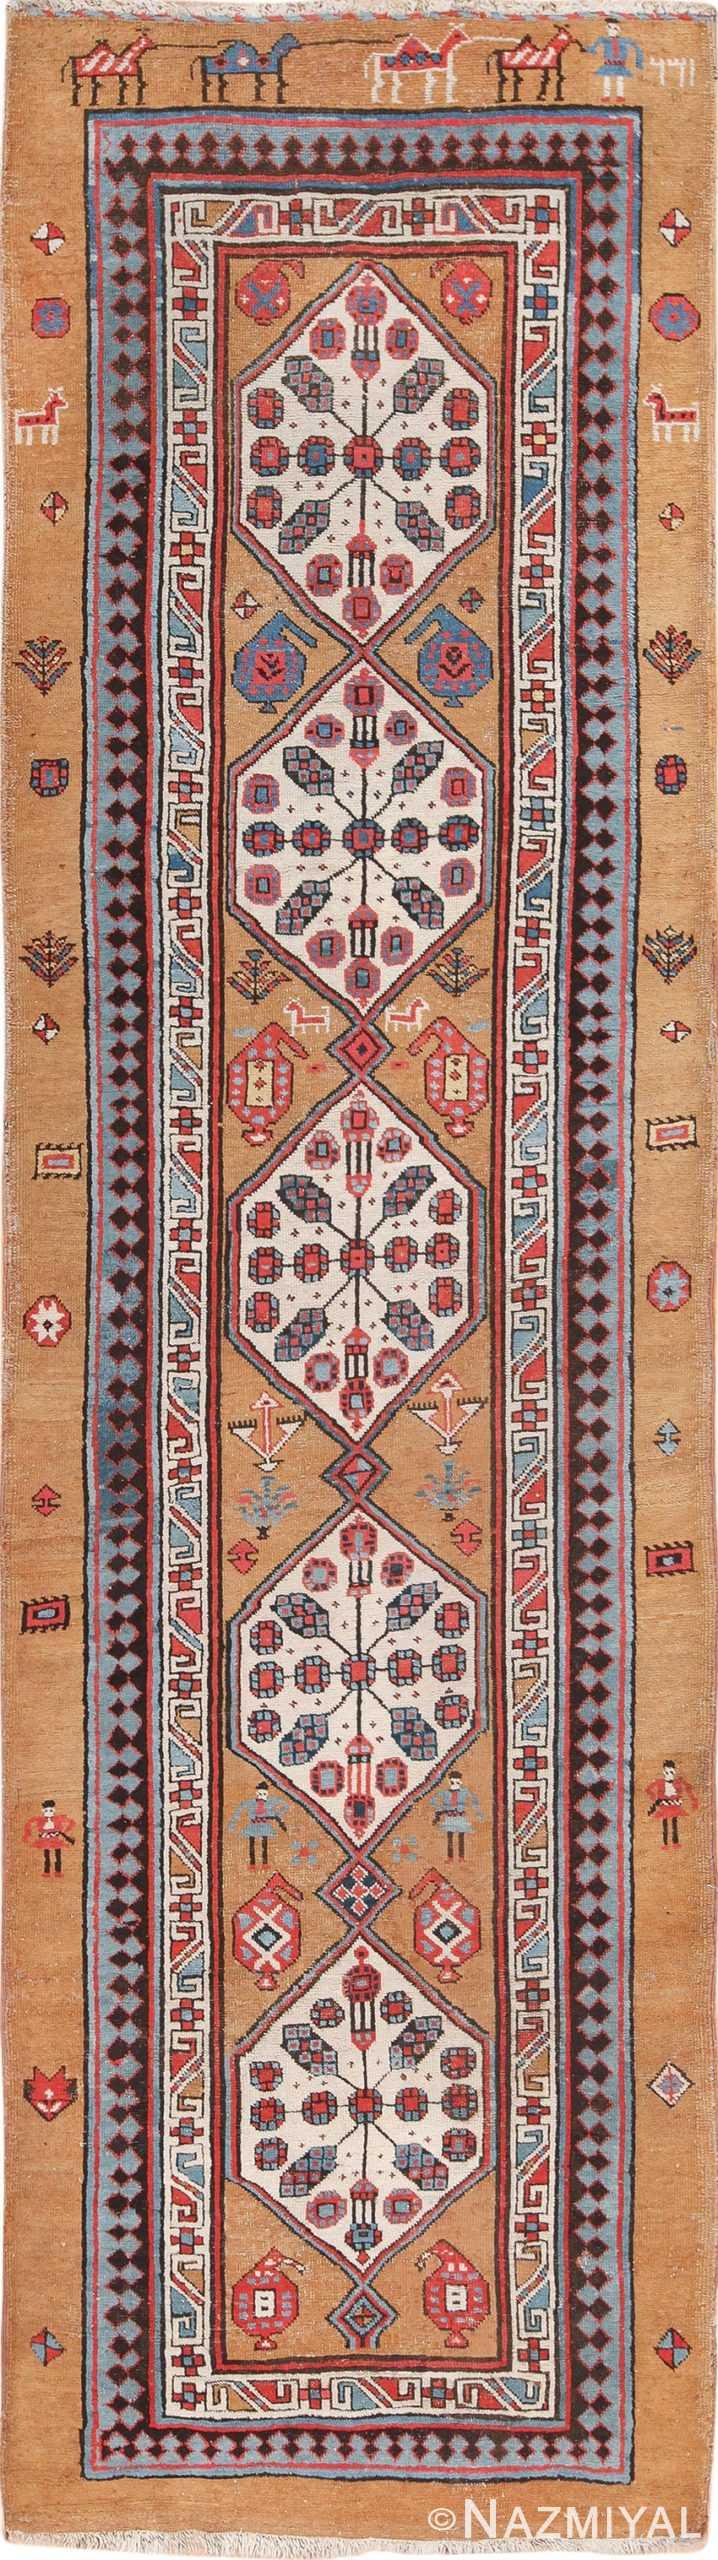 Antique Tribal Persian Bakshaish Runner Rug 49725 - Nazmiyal